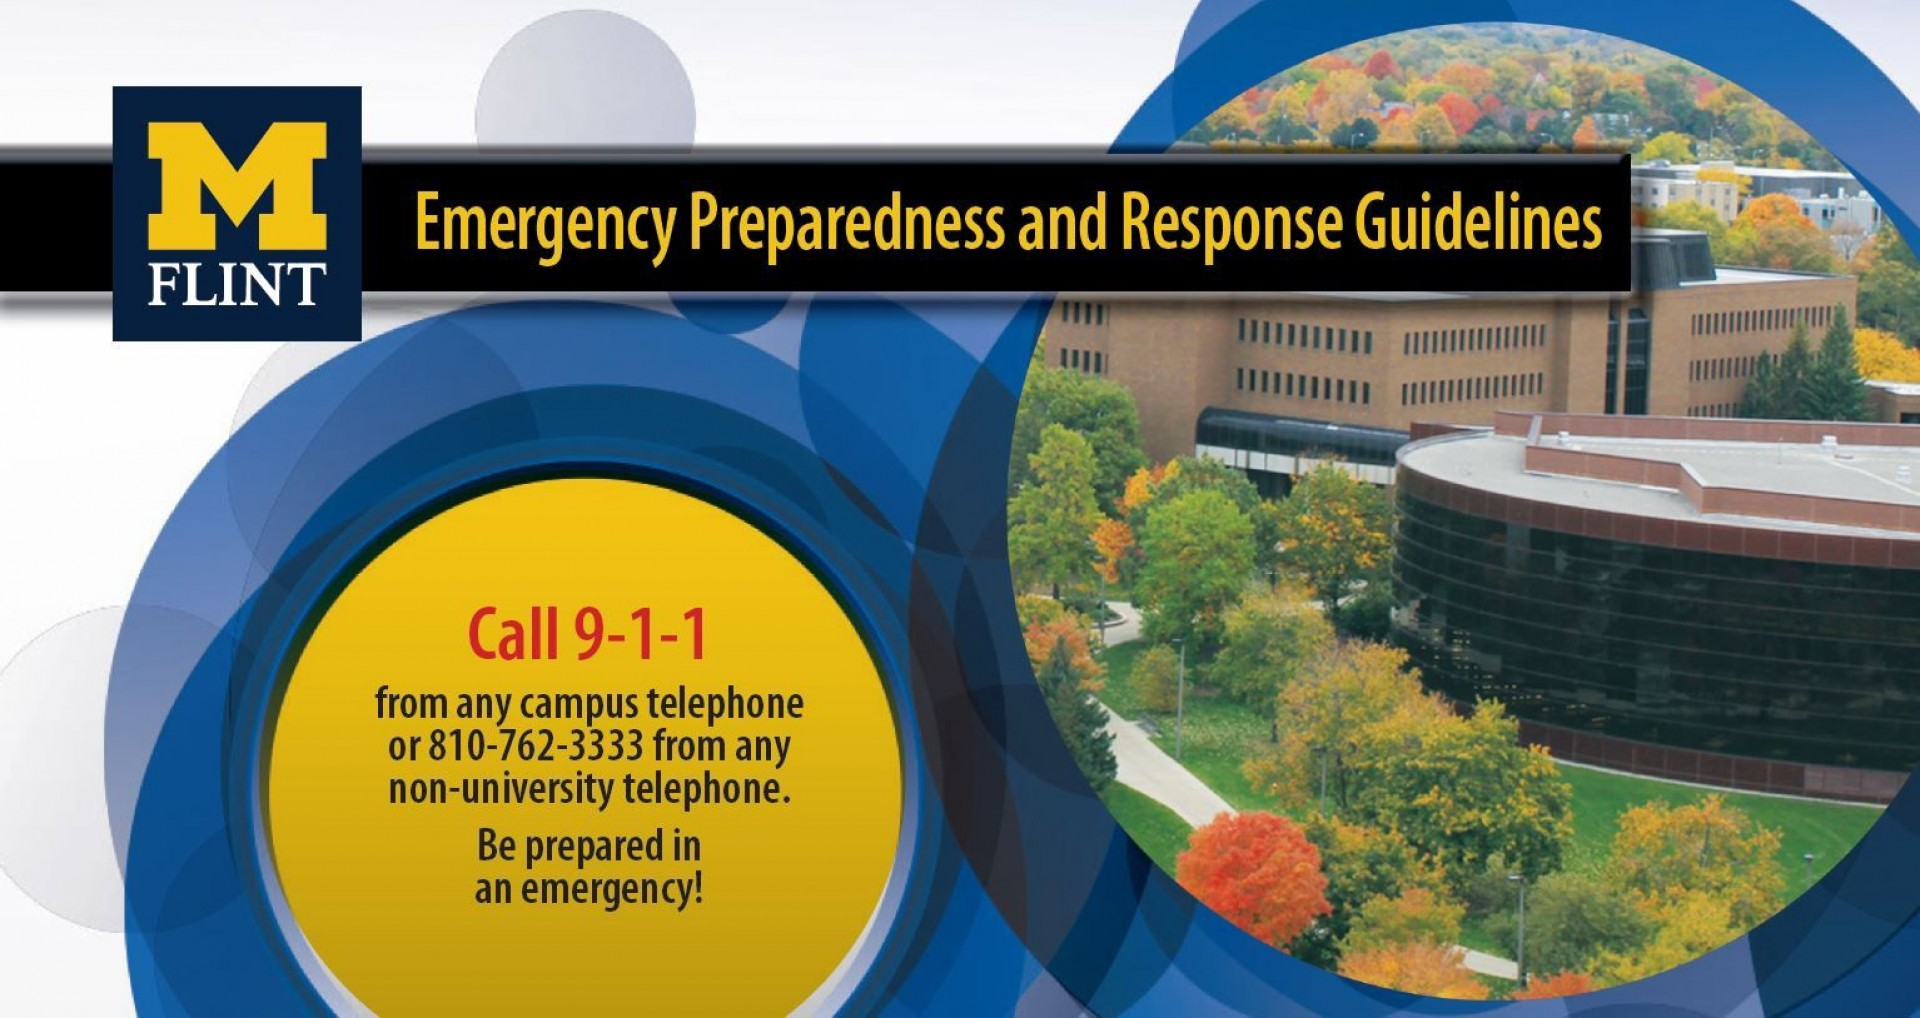 003 Impressive School Emergency Operation Plan Template Michigan Concept 1920